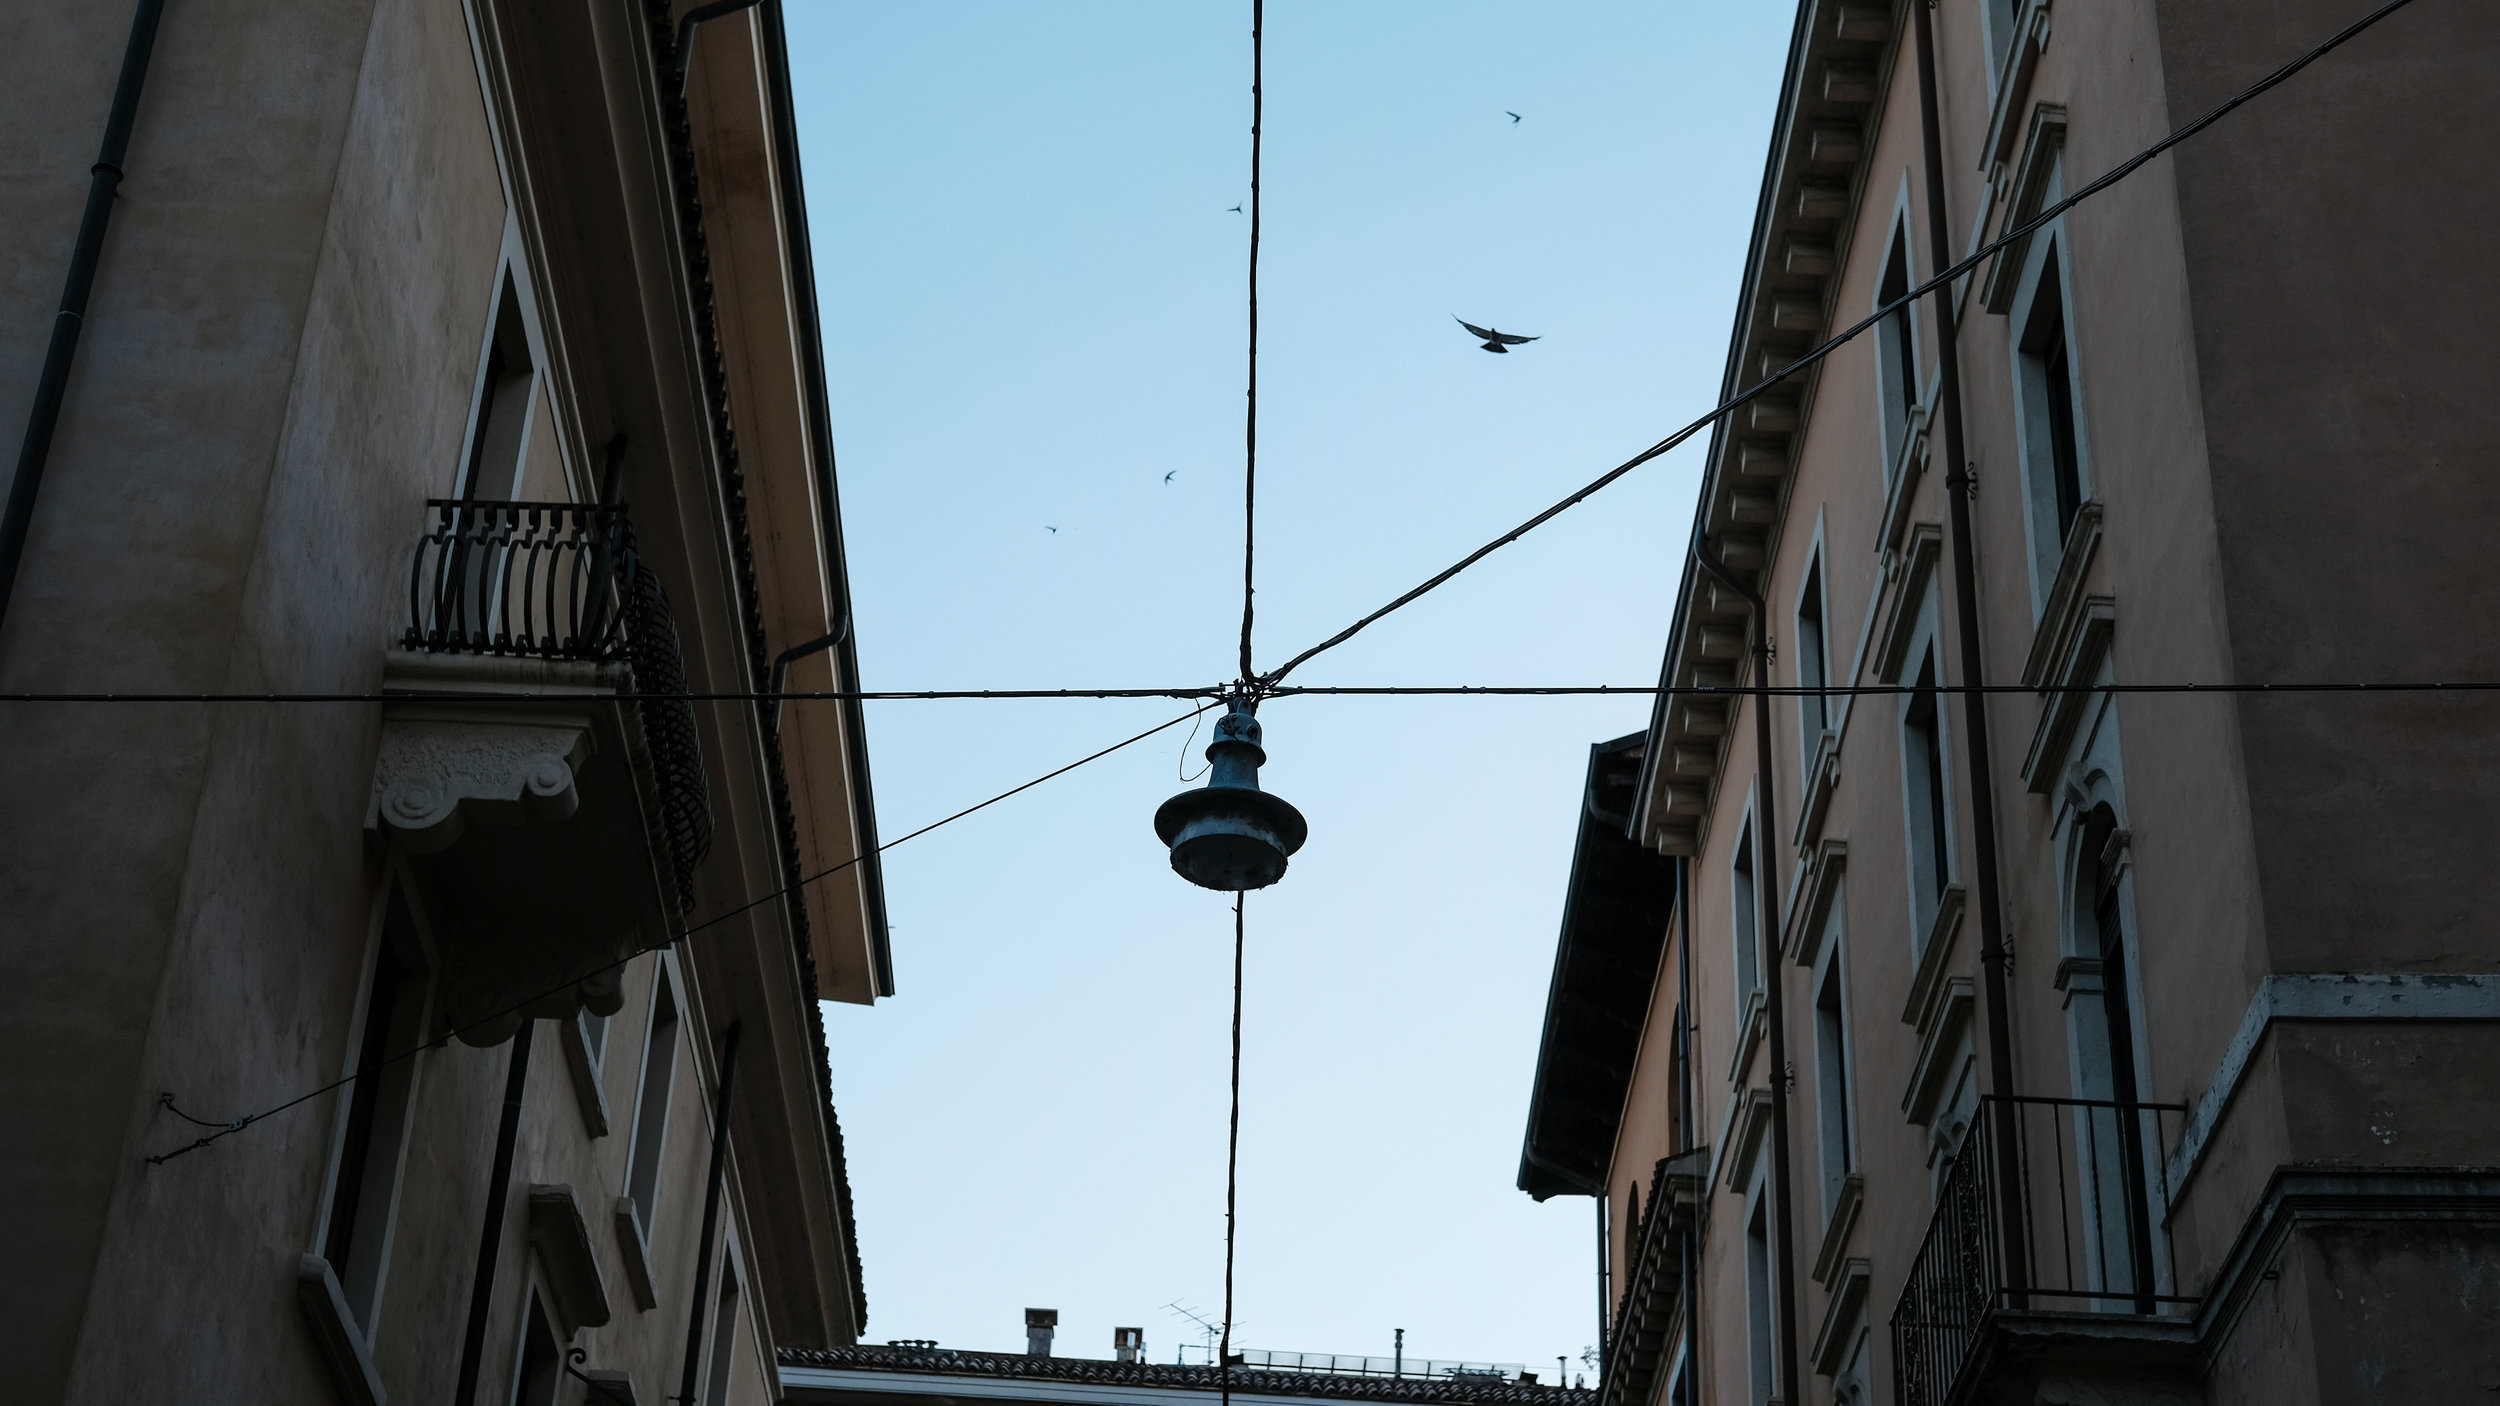 Verona, 10/7/2016, 21:31:57